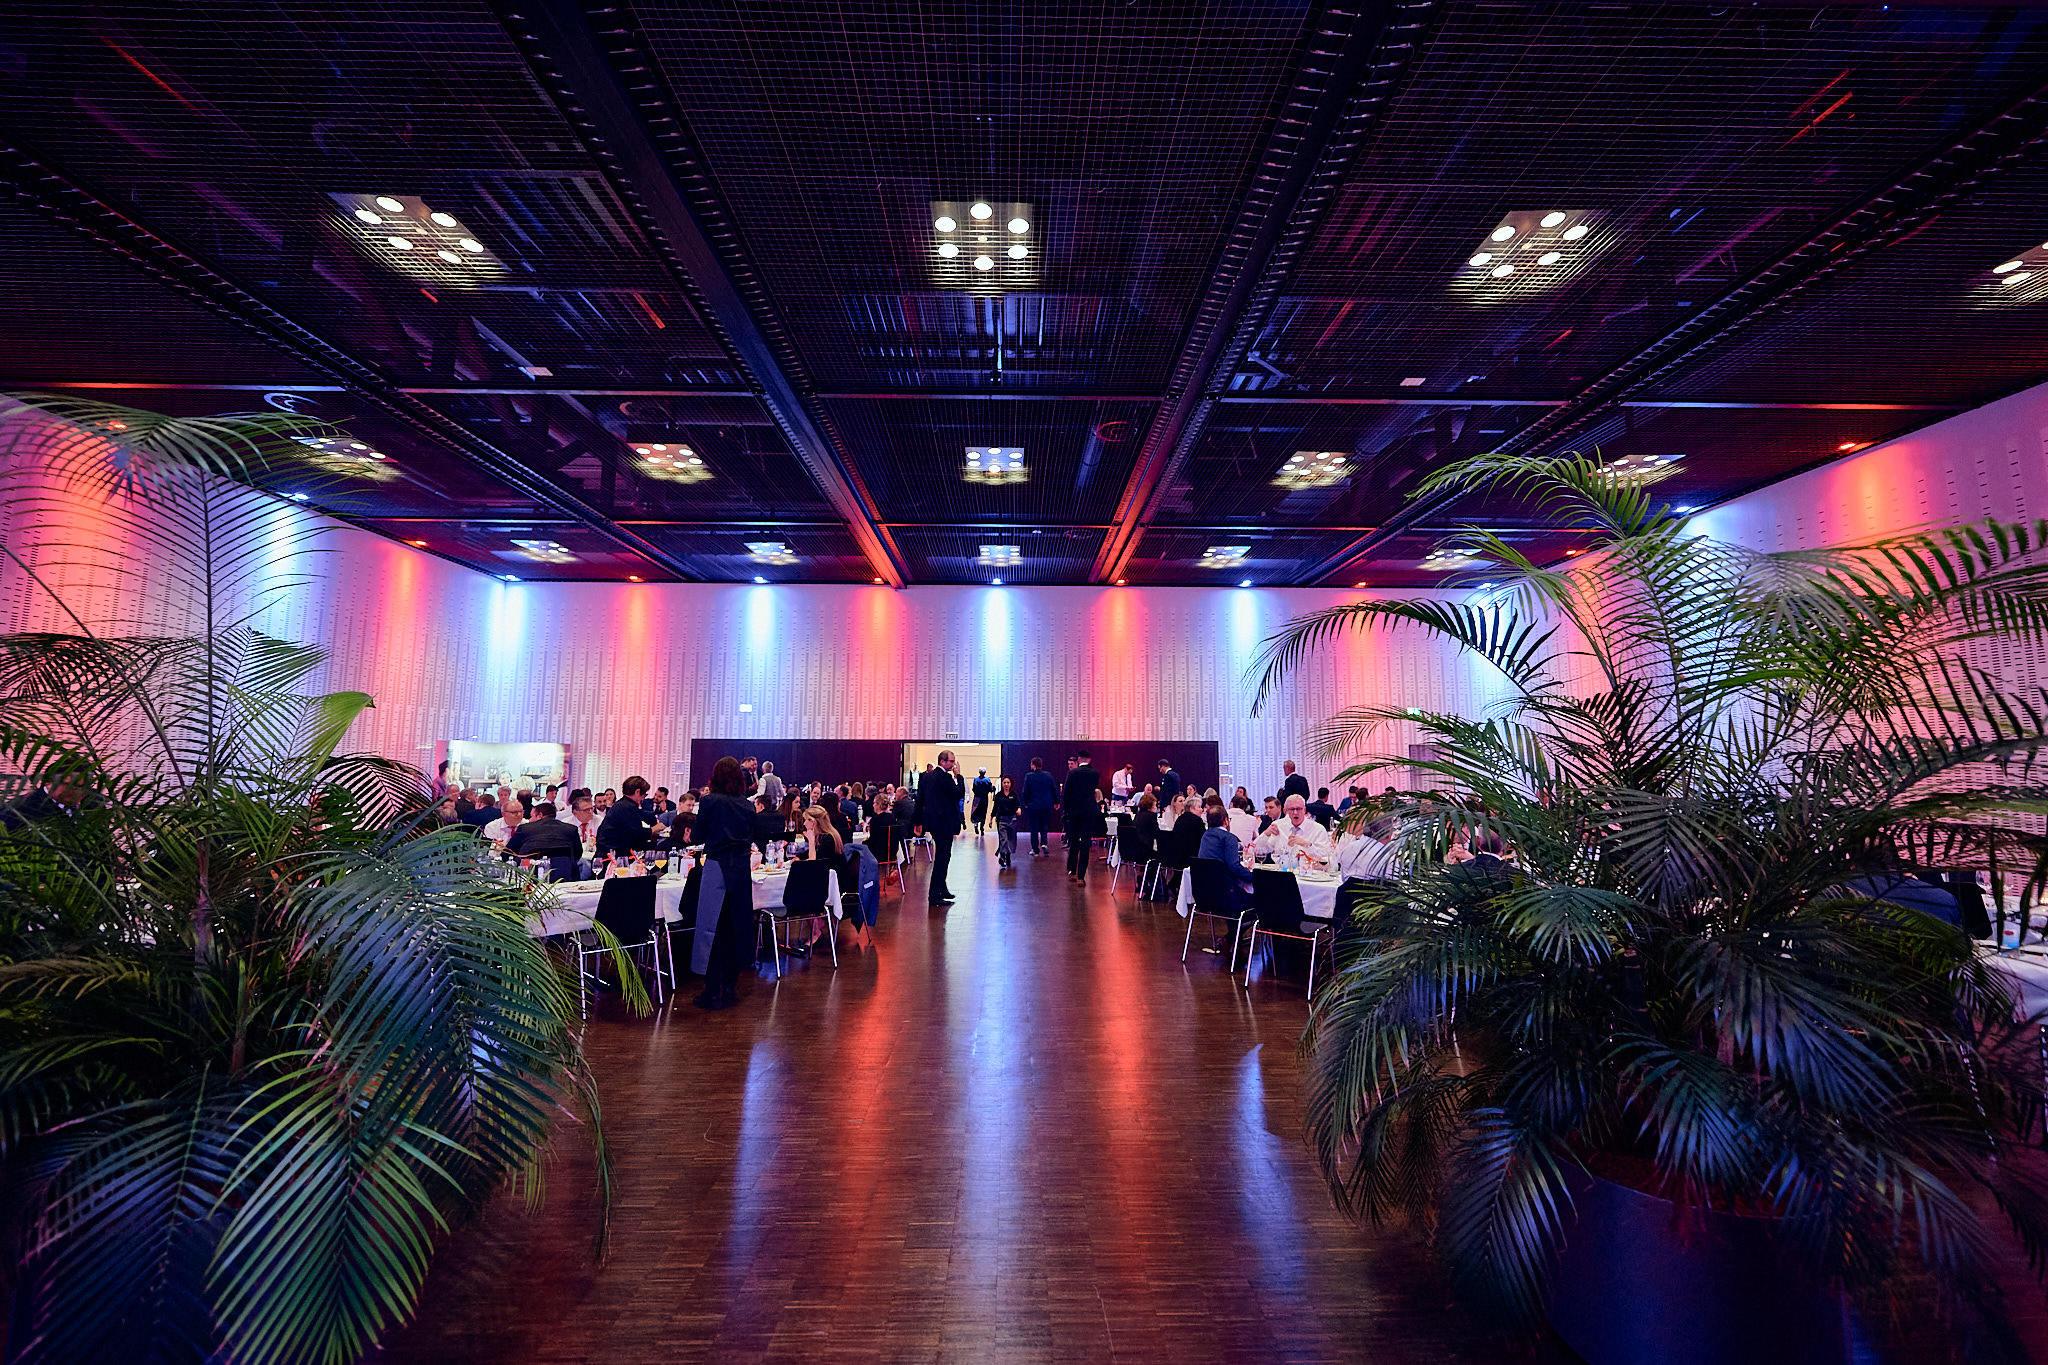 Lachensaal, mulitfunktional, bis 1200 Personen - Kultur- und Kongresszentrum Thun